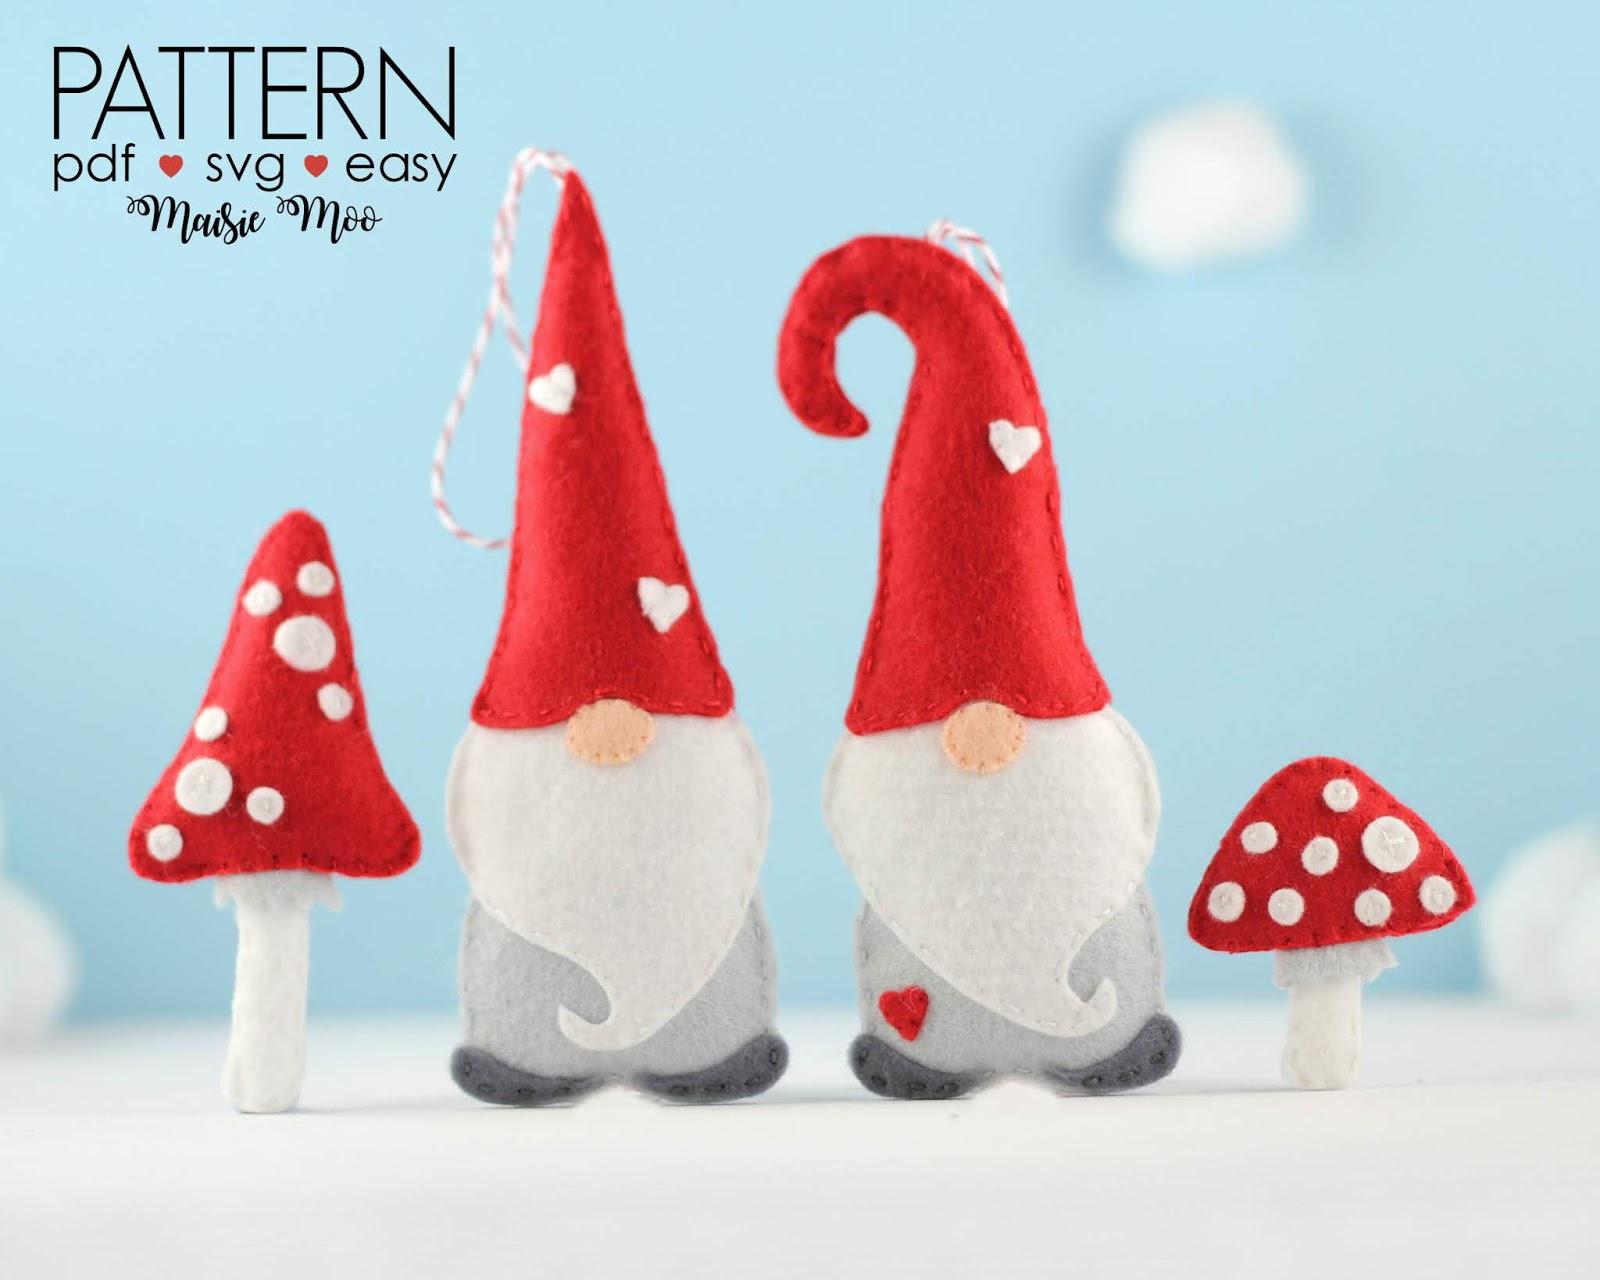 Felt Christmas Tree Ornaments Patterns.Yes I Made This Felt Christmas Gnome Pattern Christmas